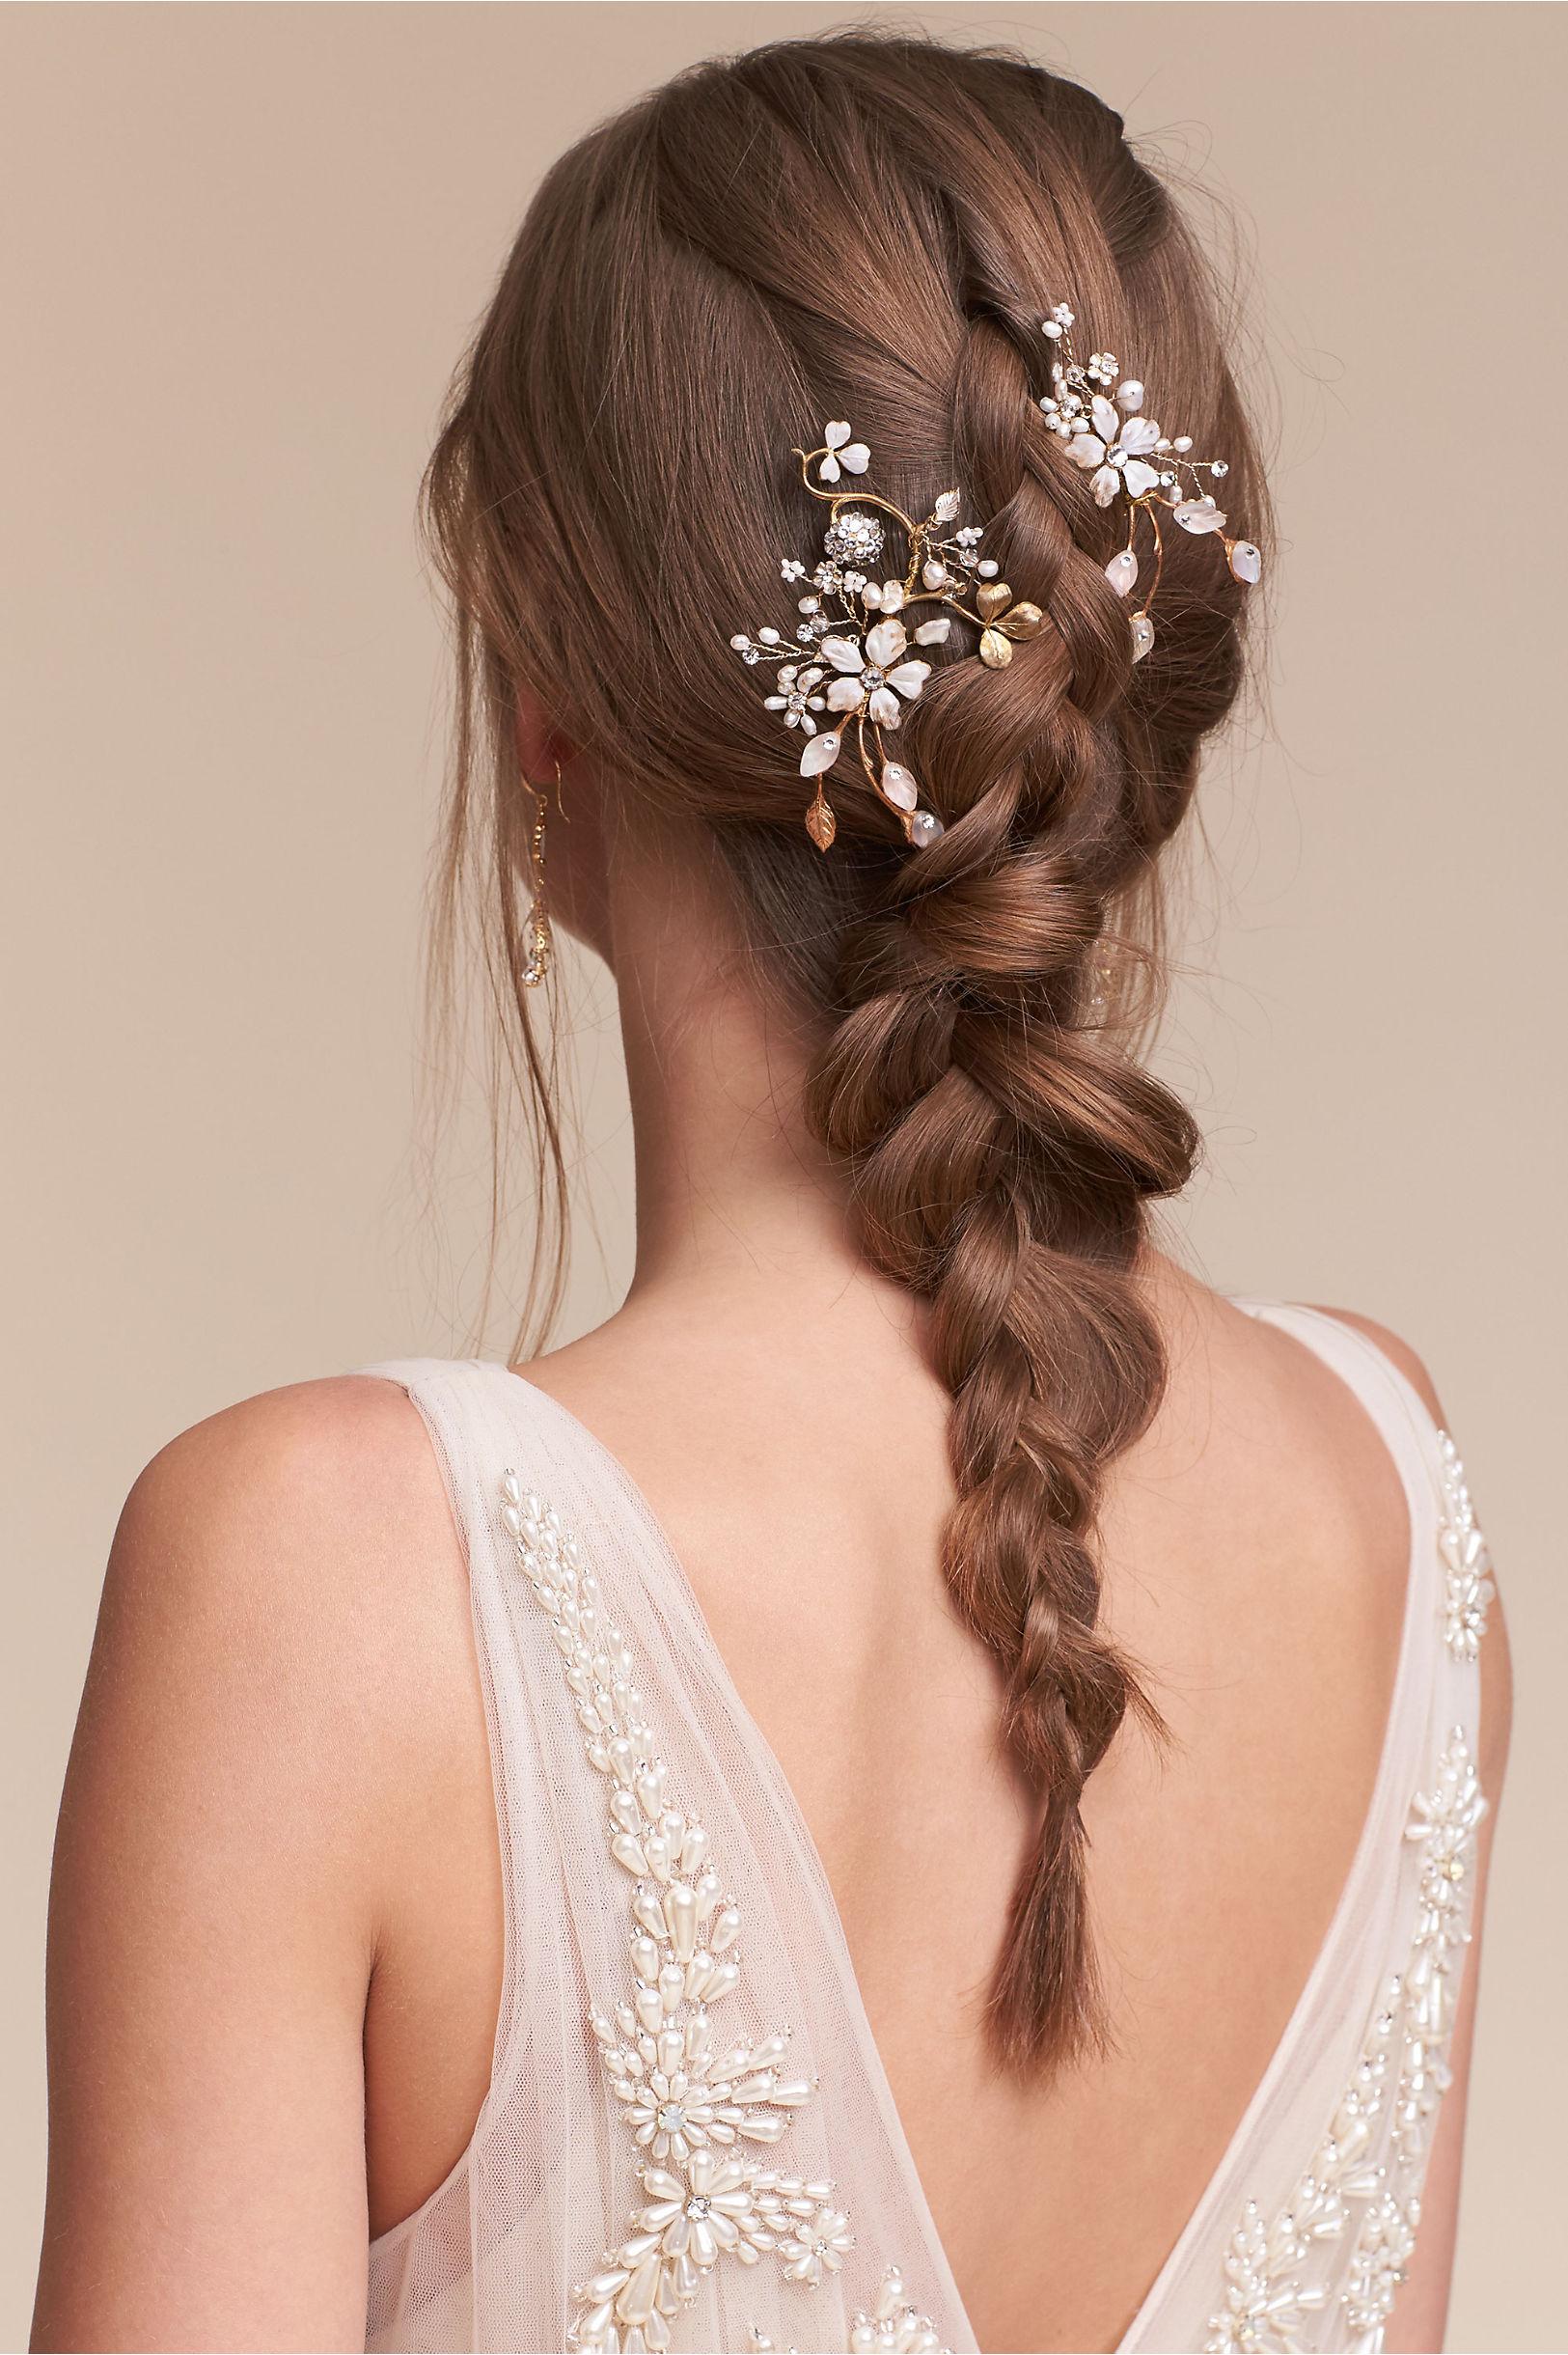 Bridal hair accessories for long hair - Winter Garden Hair Combs